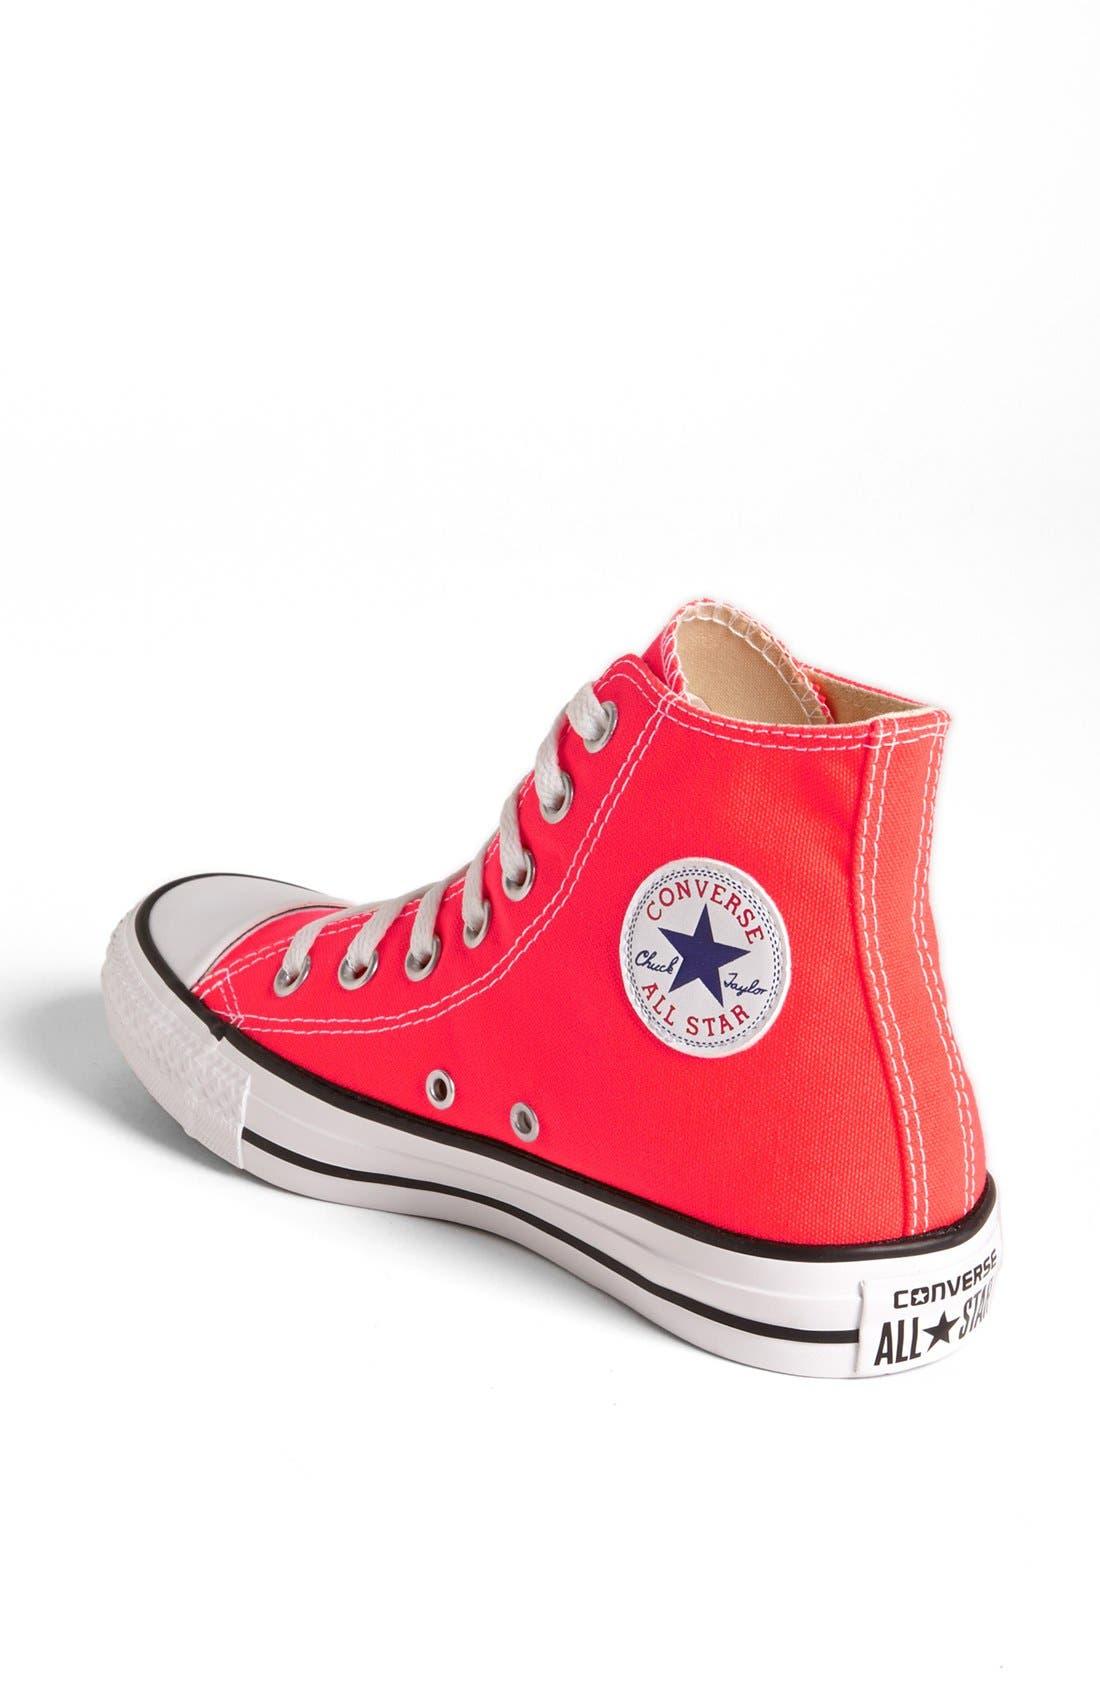 Alternate Image 2  - Converse Chuck Taylor® All Star® 'Fiery Coral' High Top Sneaker (Women)